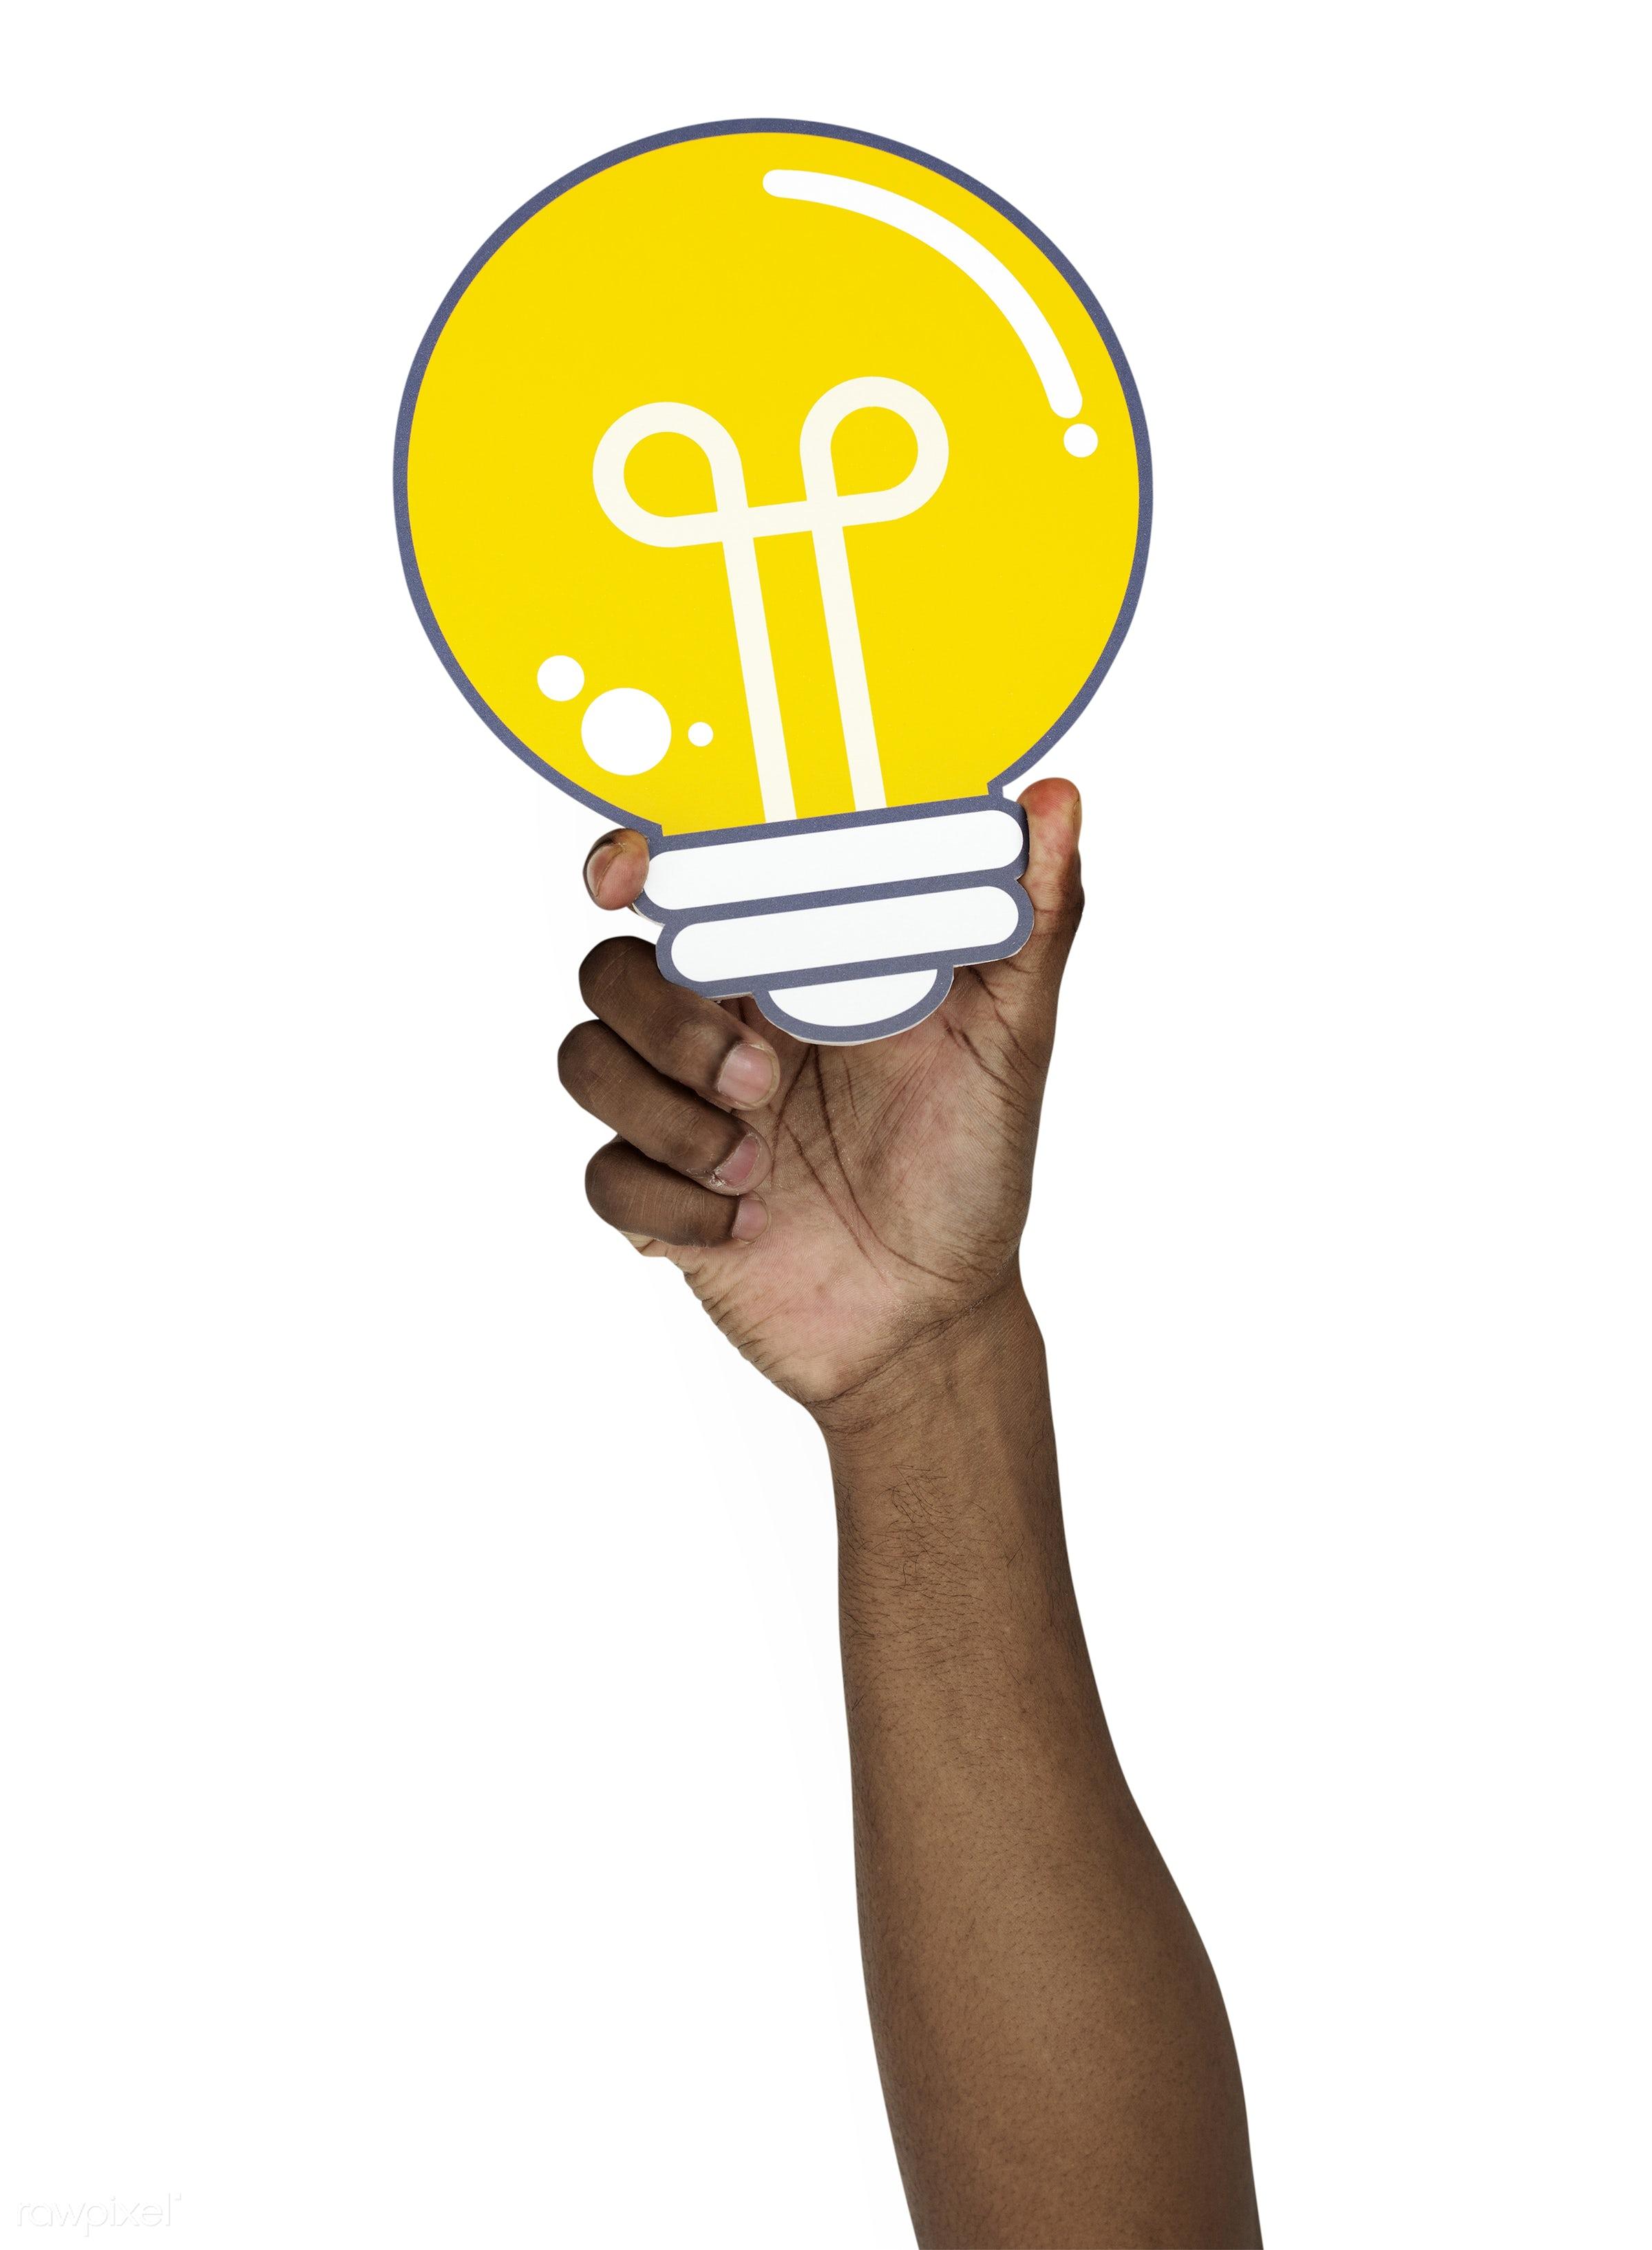 idea, lightbulb, design, eureka, background, brainstorm, bulb, creative, creativity, hand, hold, holding, human, ideas,...